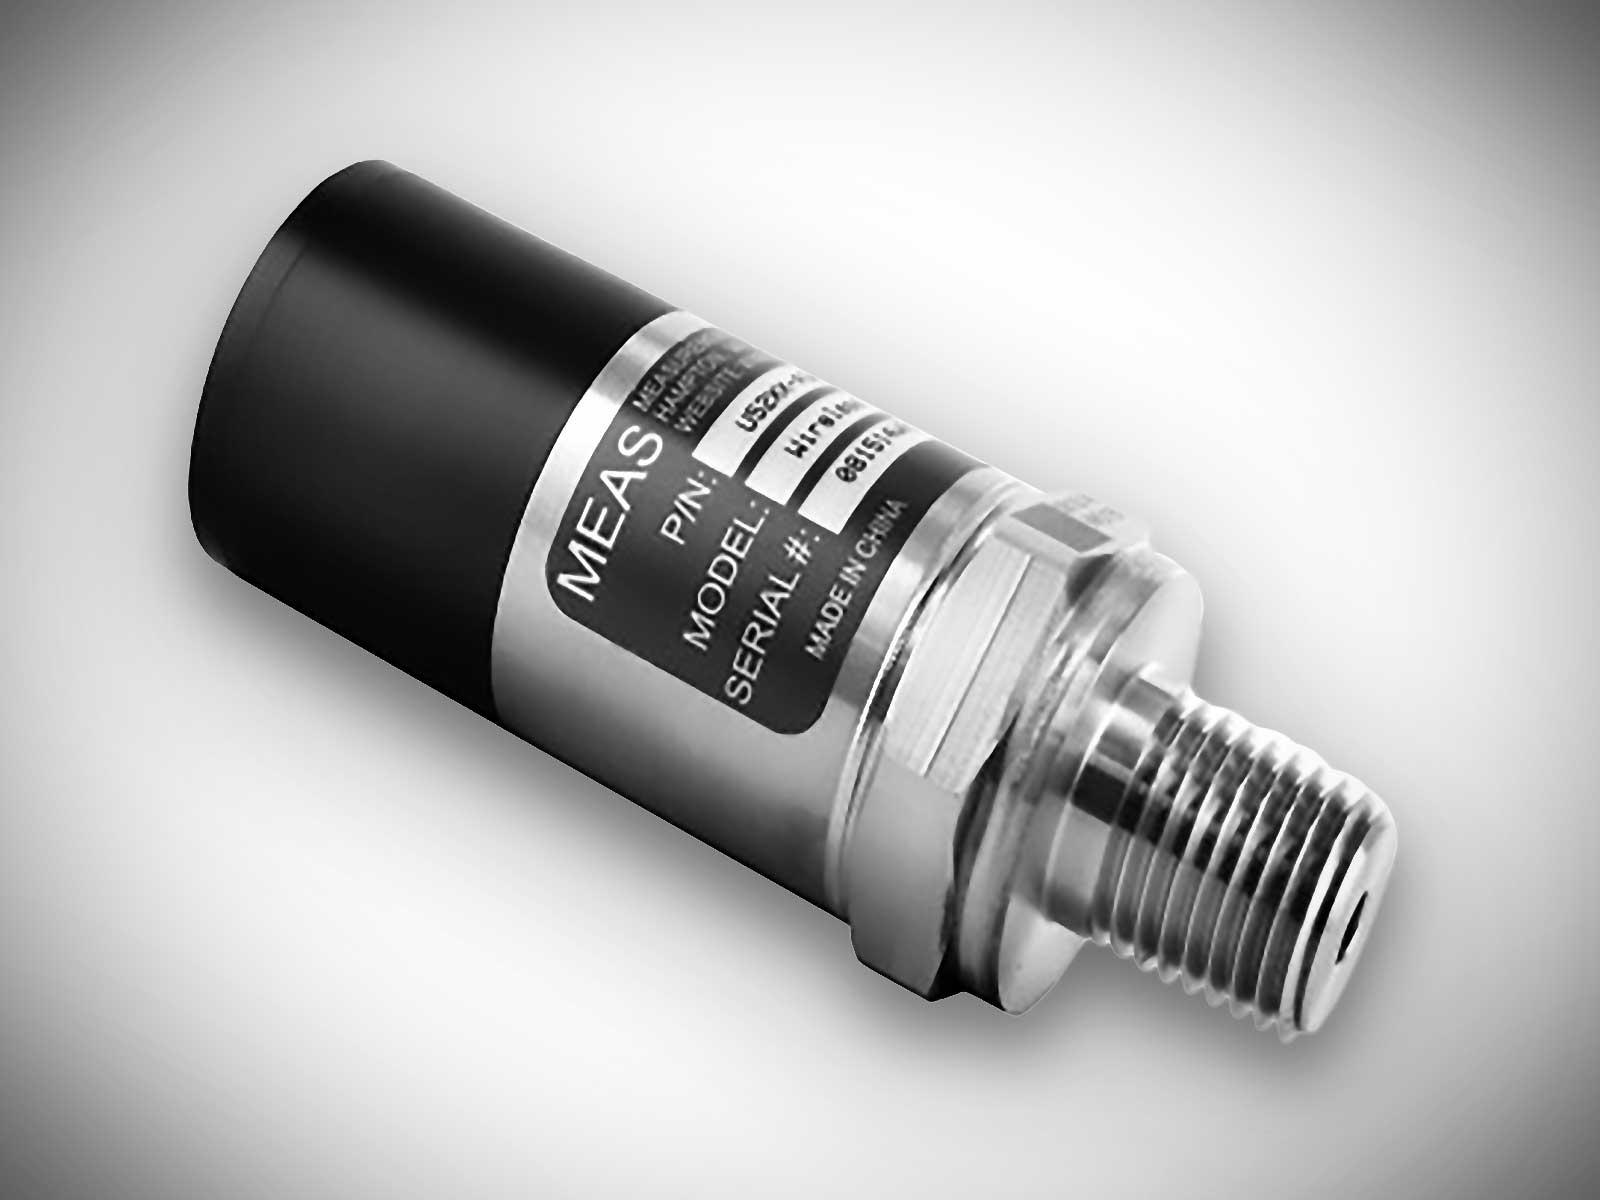 TE drahtloser Druckmessumformer - Schildknecht AG Bluetooth Sensoren